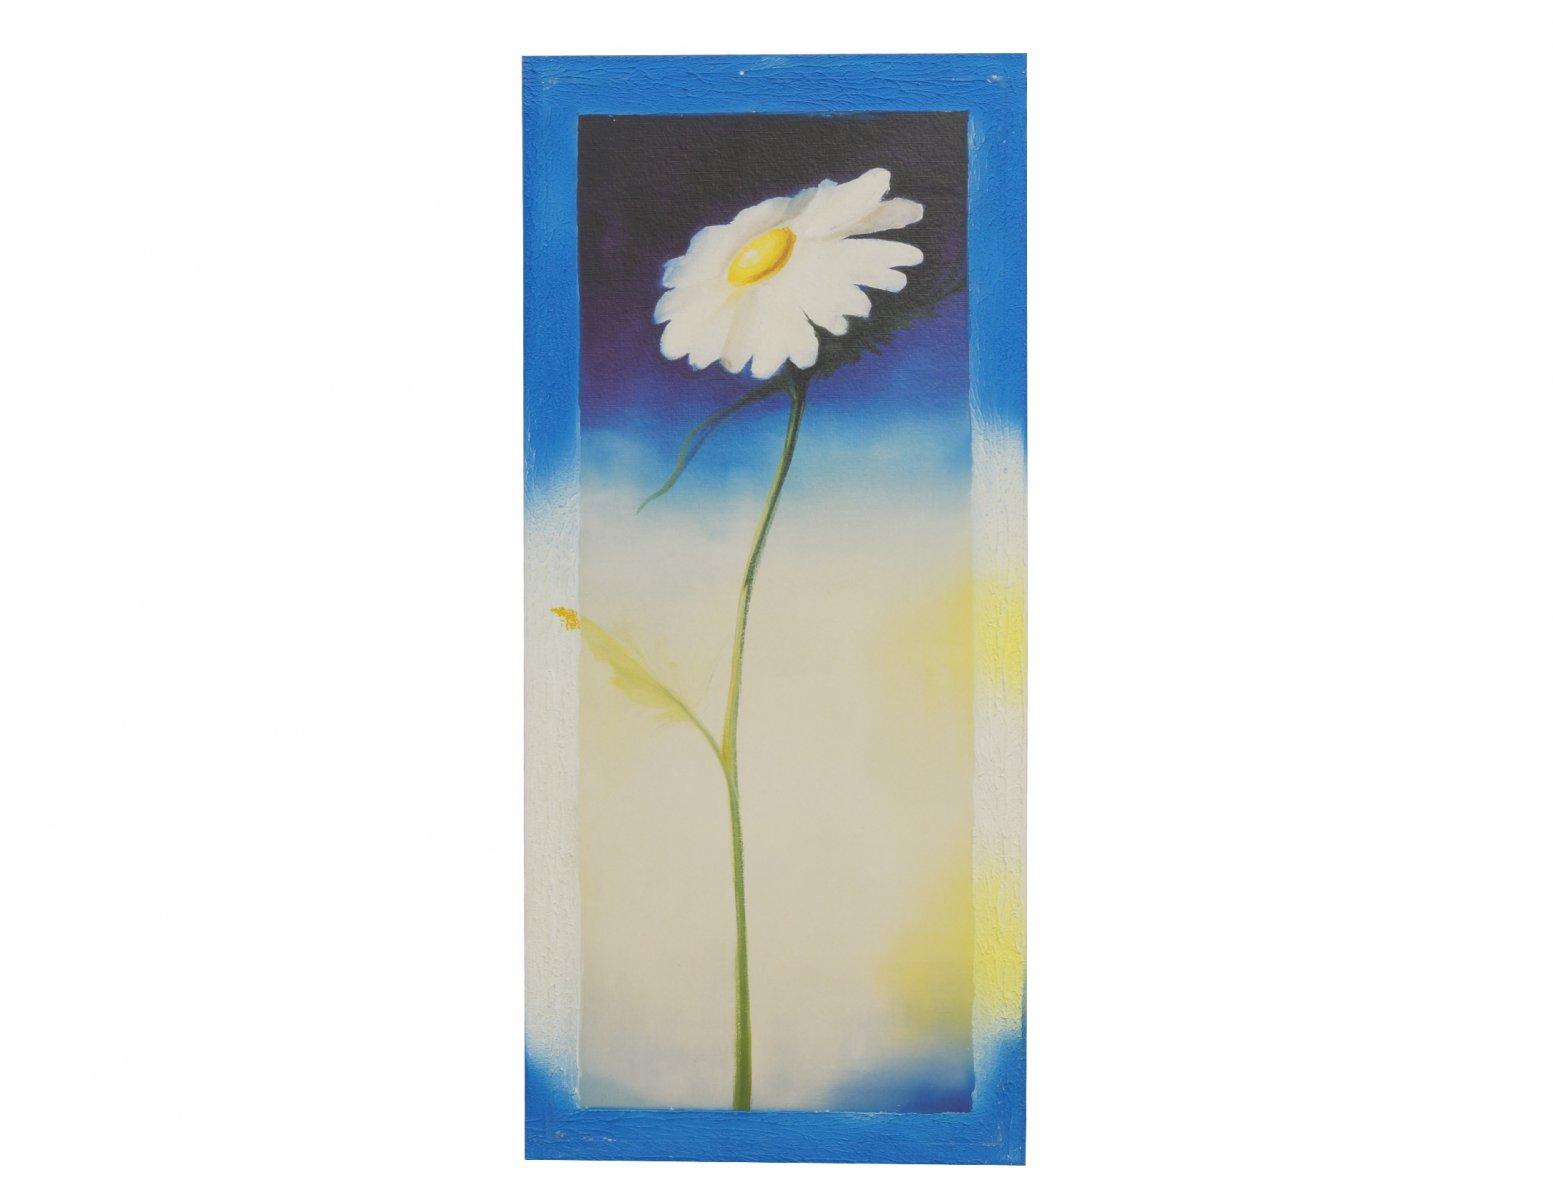 Obraz na plotnie kwiat